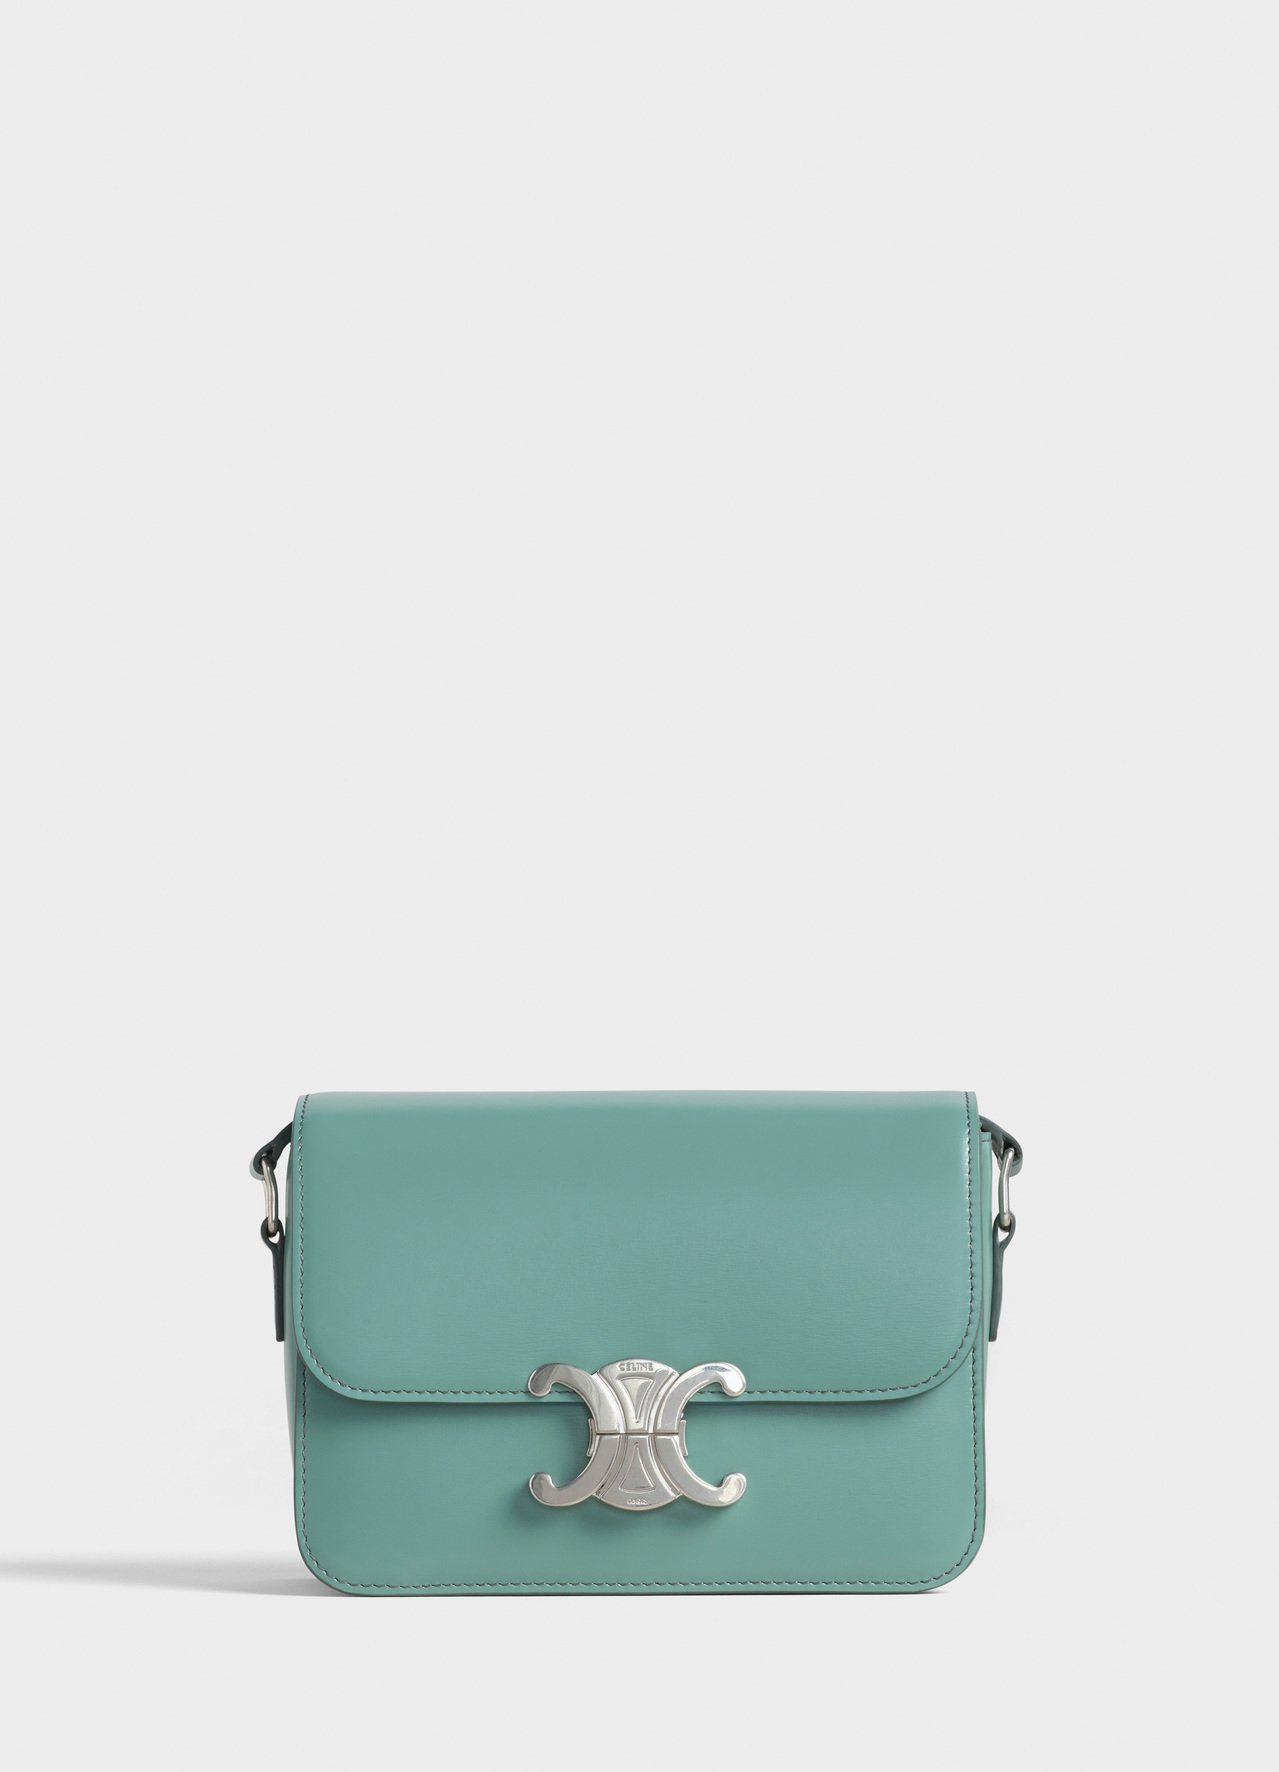 CELINE Triomphe青瓷色光滑小牛皮小型肩背包,售價10萬5,000元...